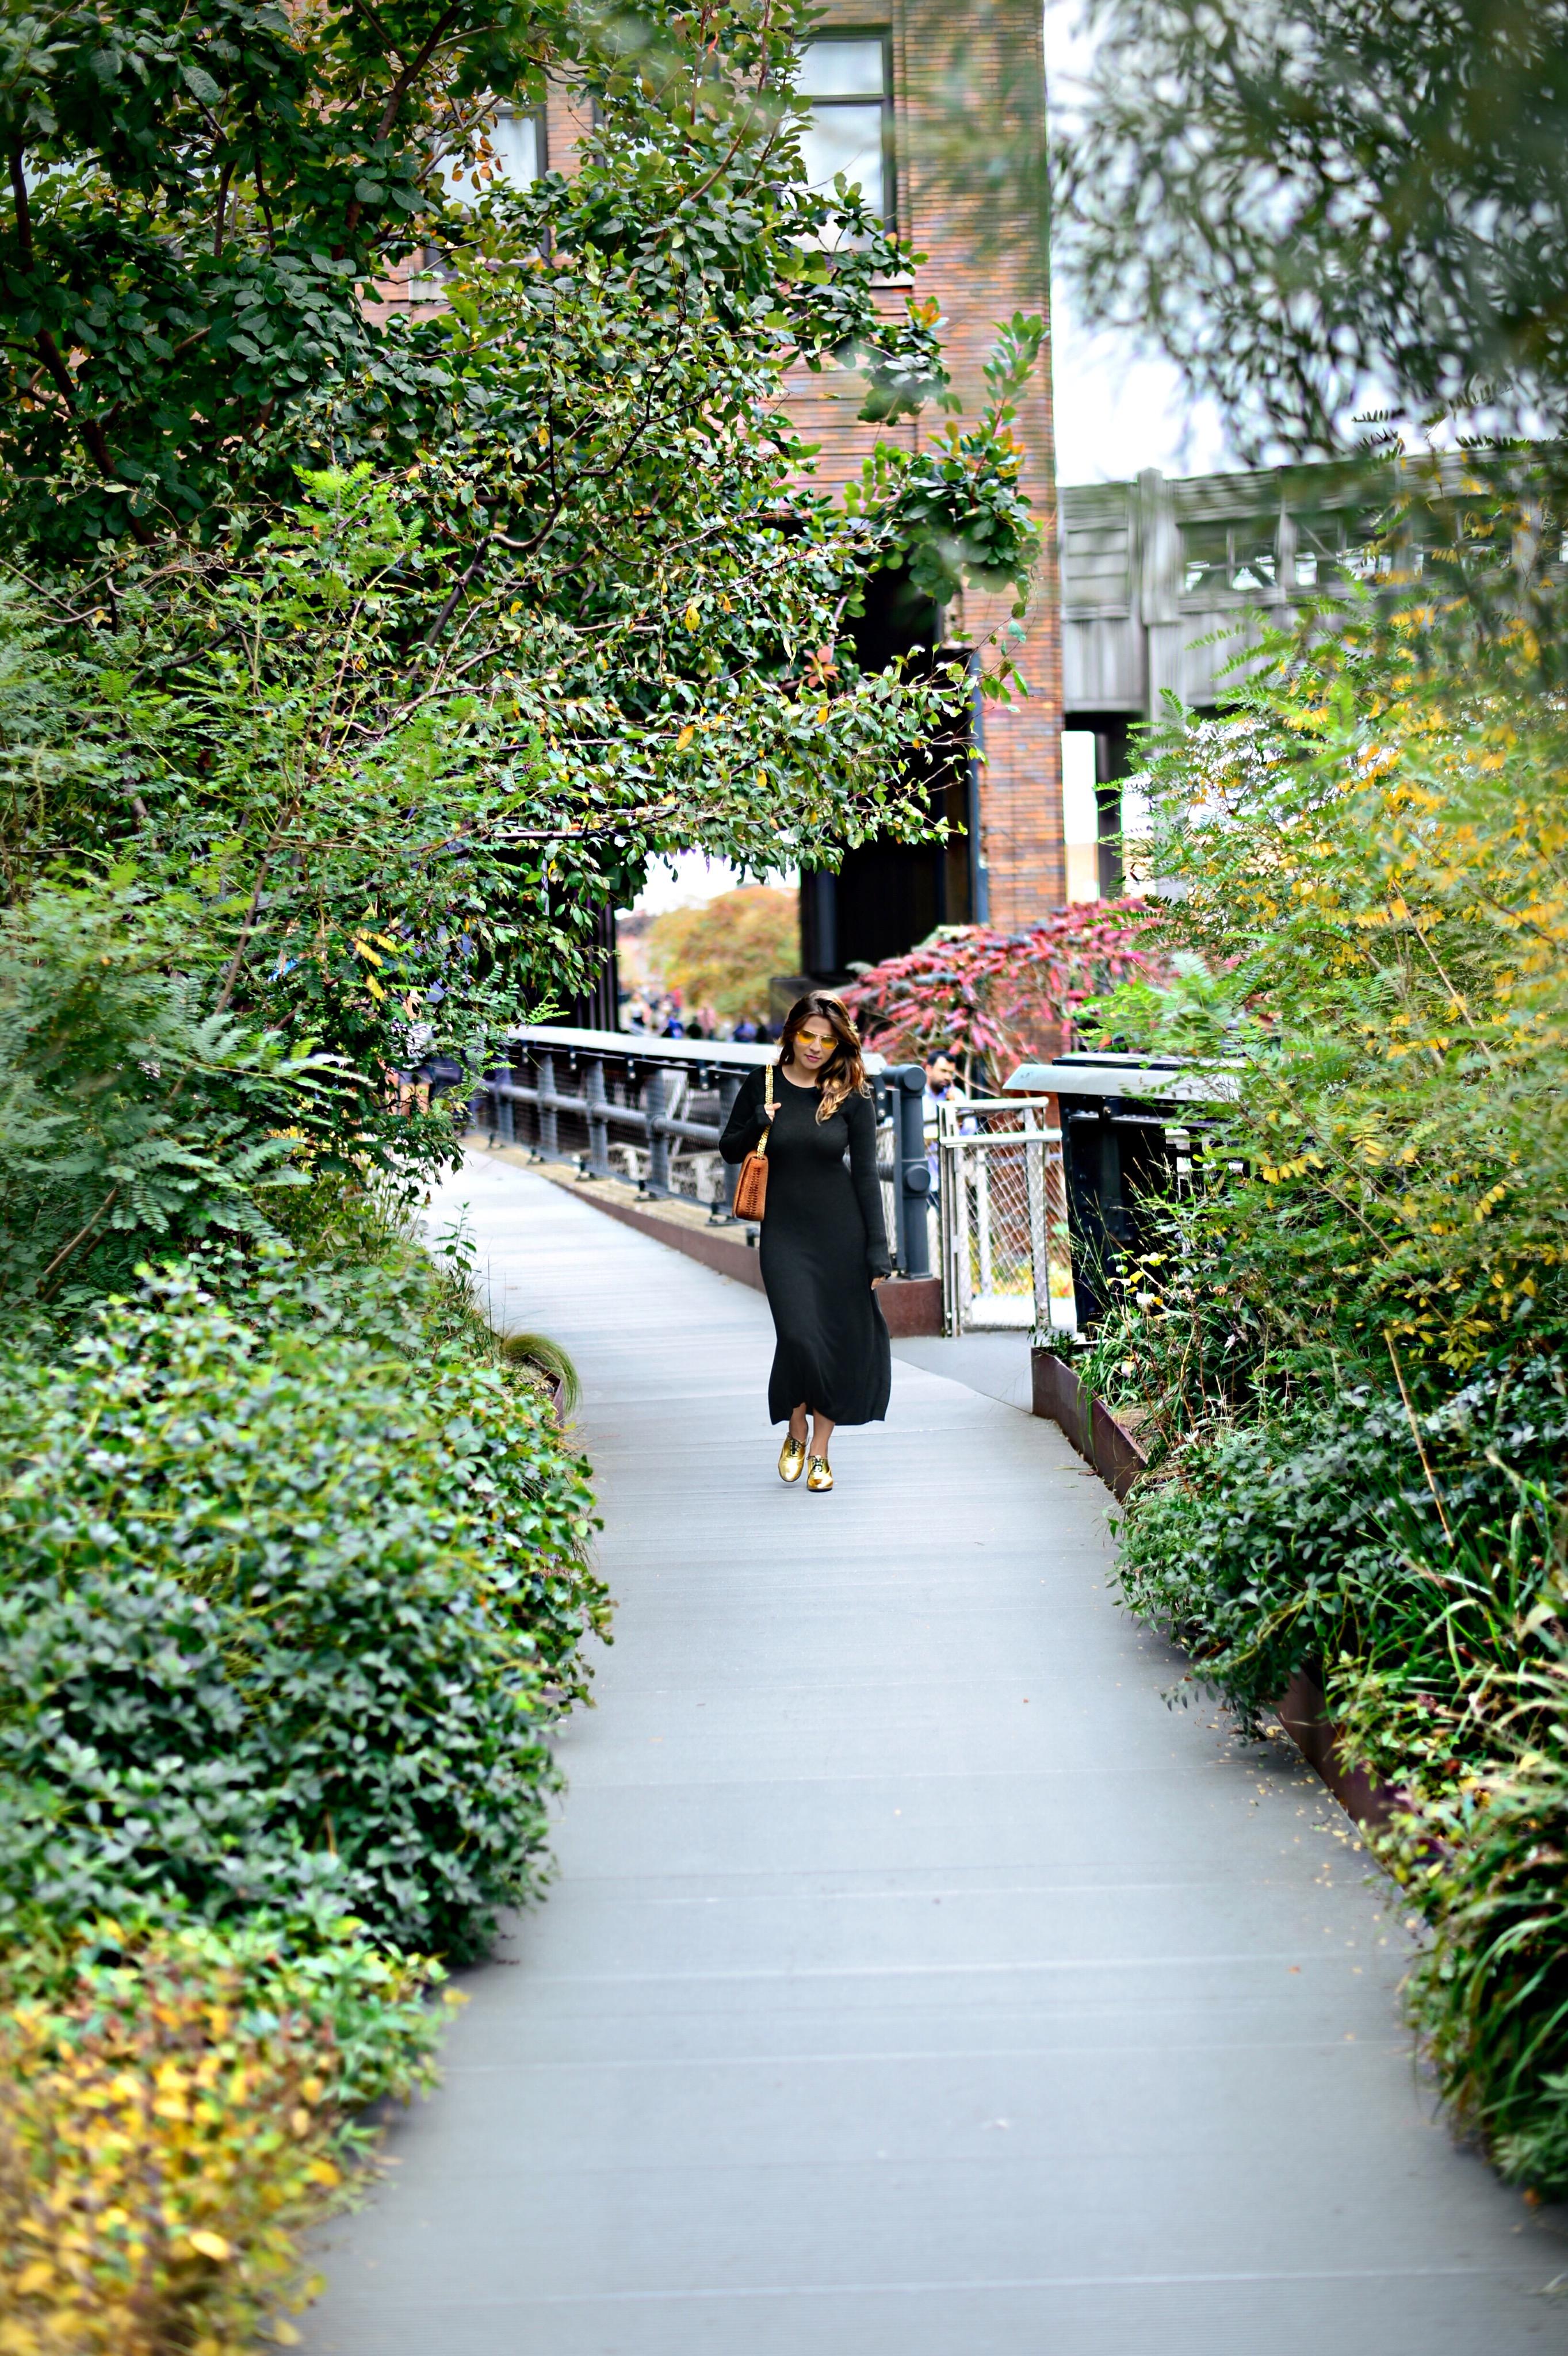 jersey-dress-gold-shoes-alley-girl-betul-yildiz-new-york-fashion-blogger-13